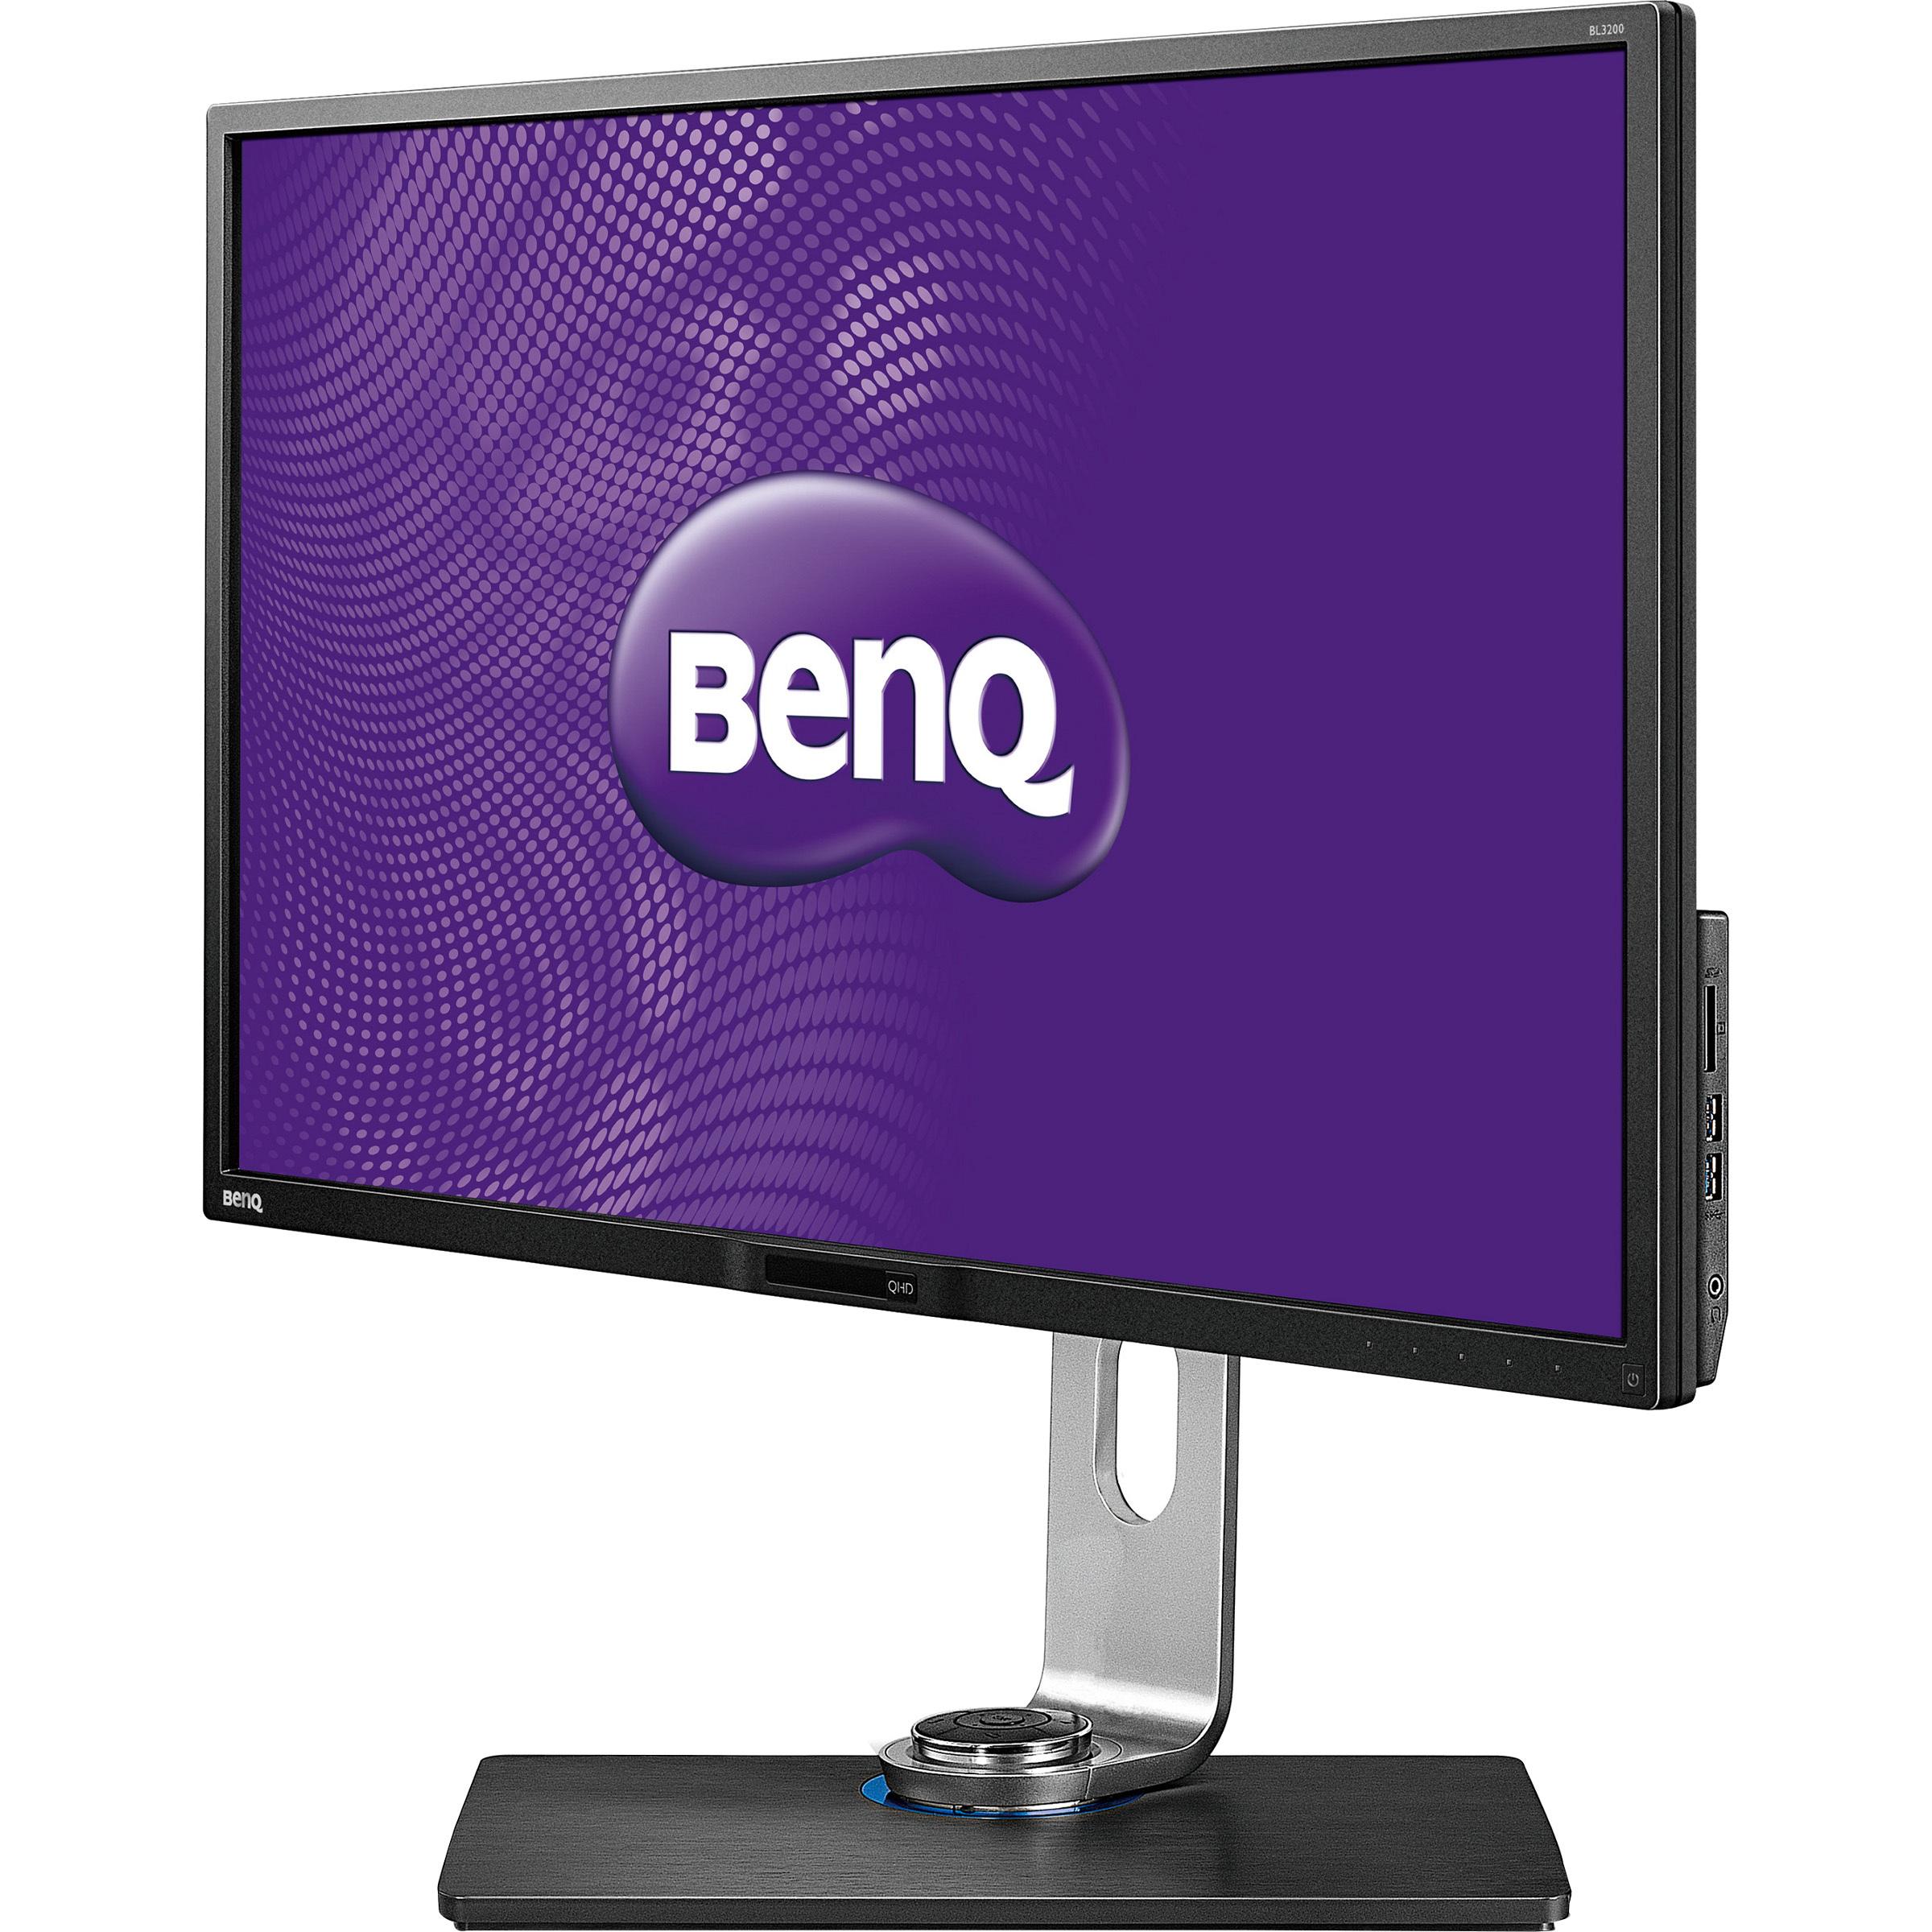 Free benq cm 3200 driver download Download